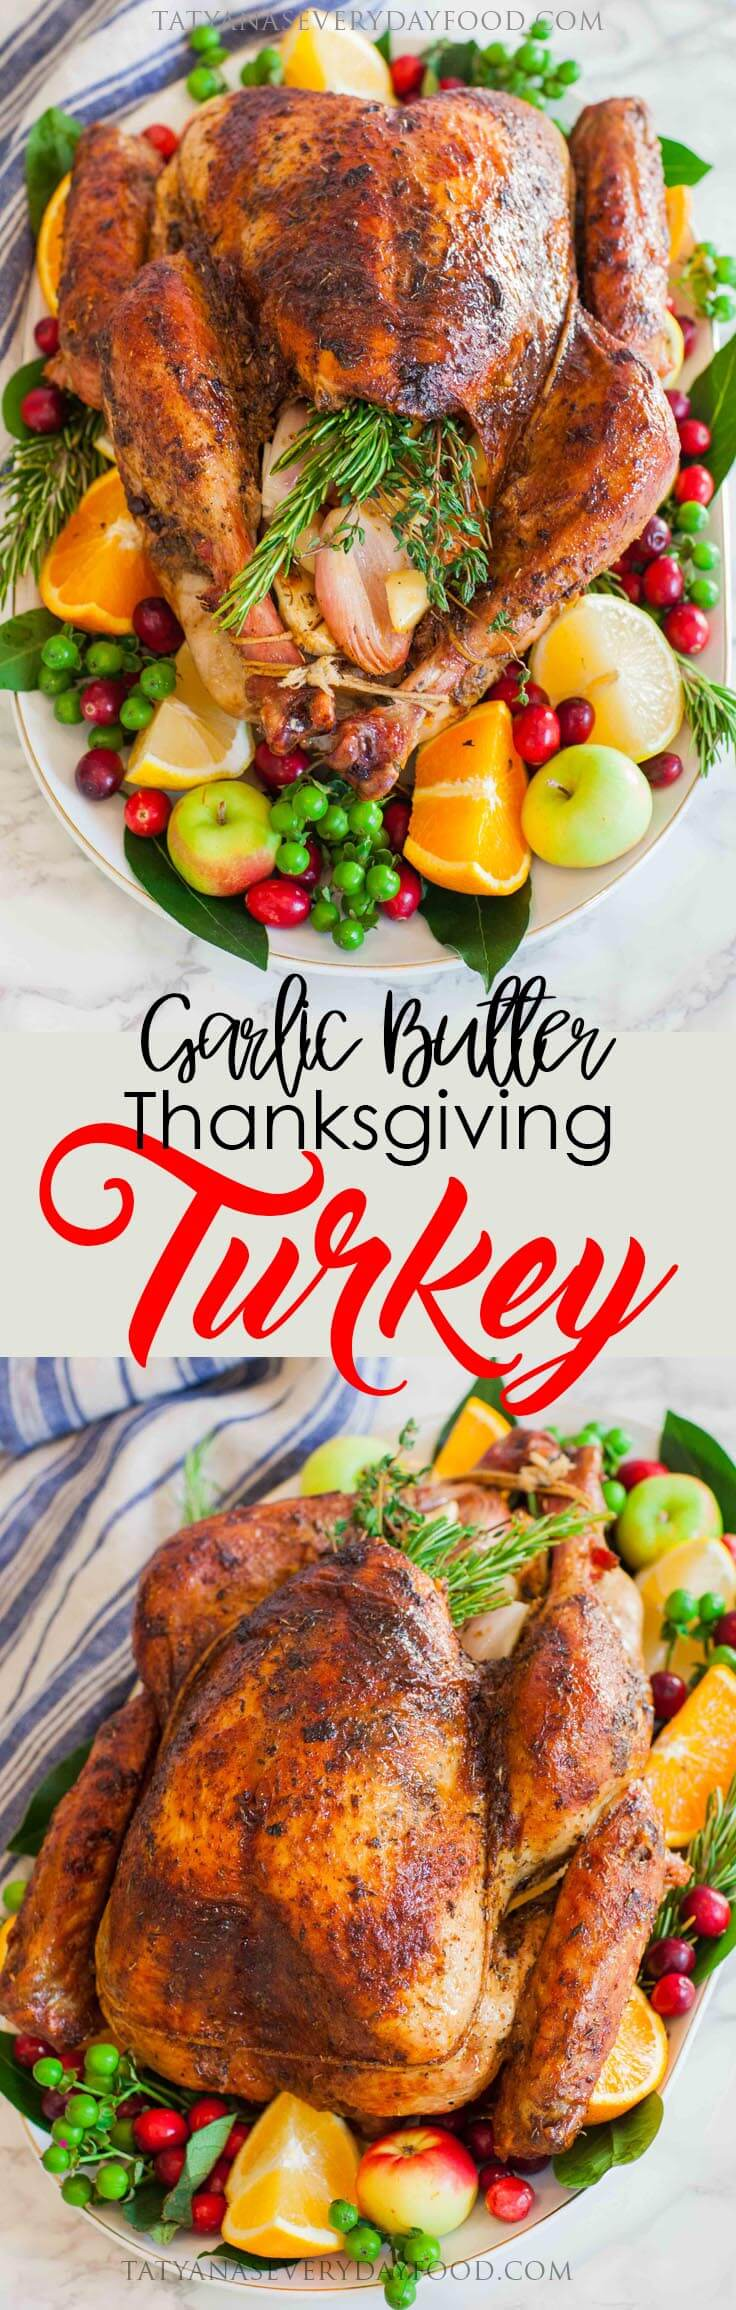 Garlic Butter Thanksgiving Turkey Recipe with video